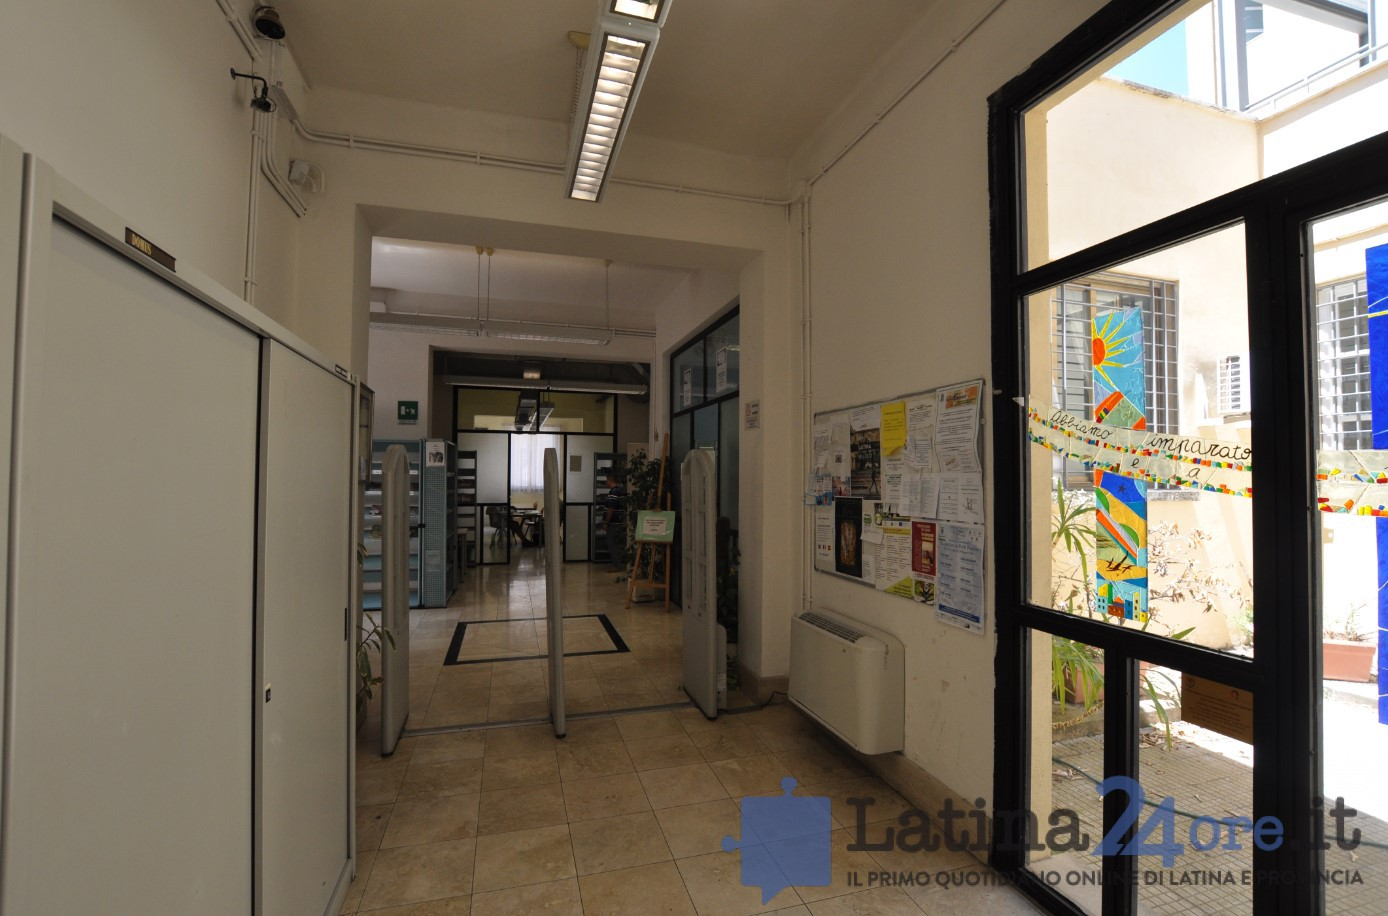 biblioteca-latina-ingresso-2016